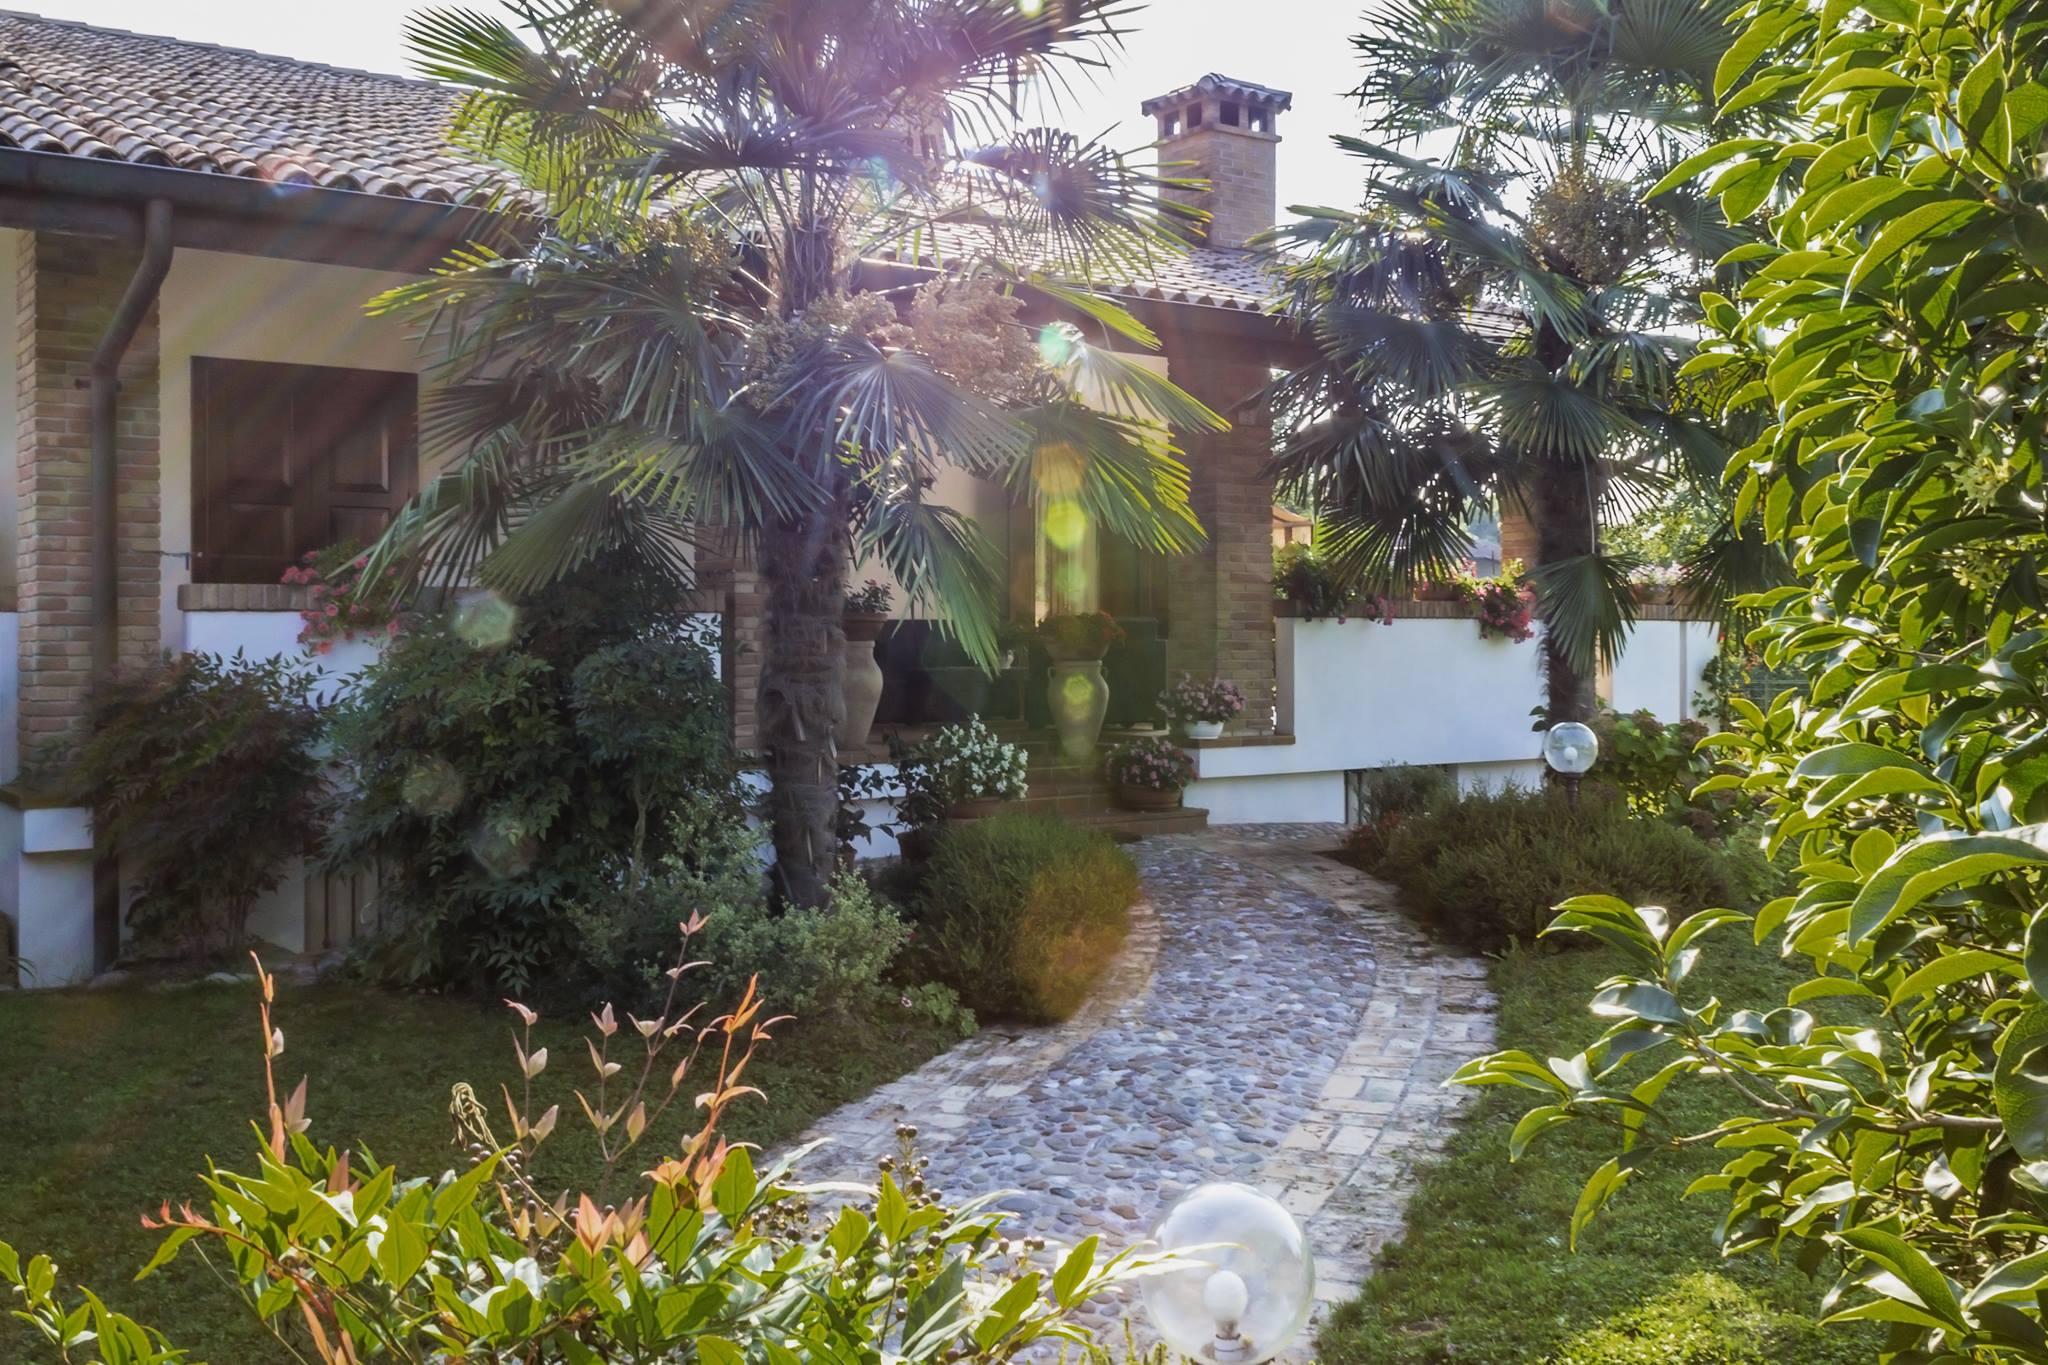 Dove dormire a Sacile: Bed and Breakfast Ca' Livenza - ingresso